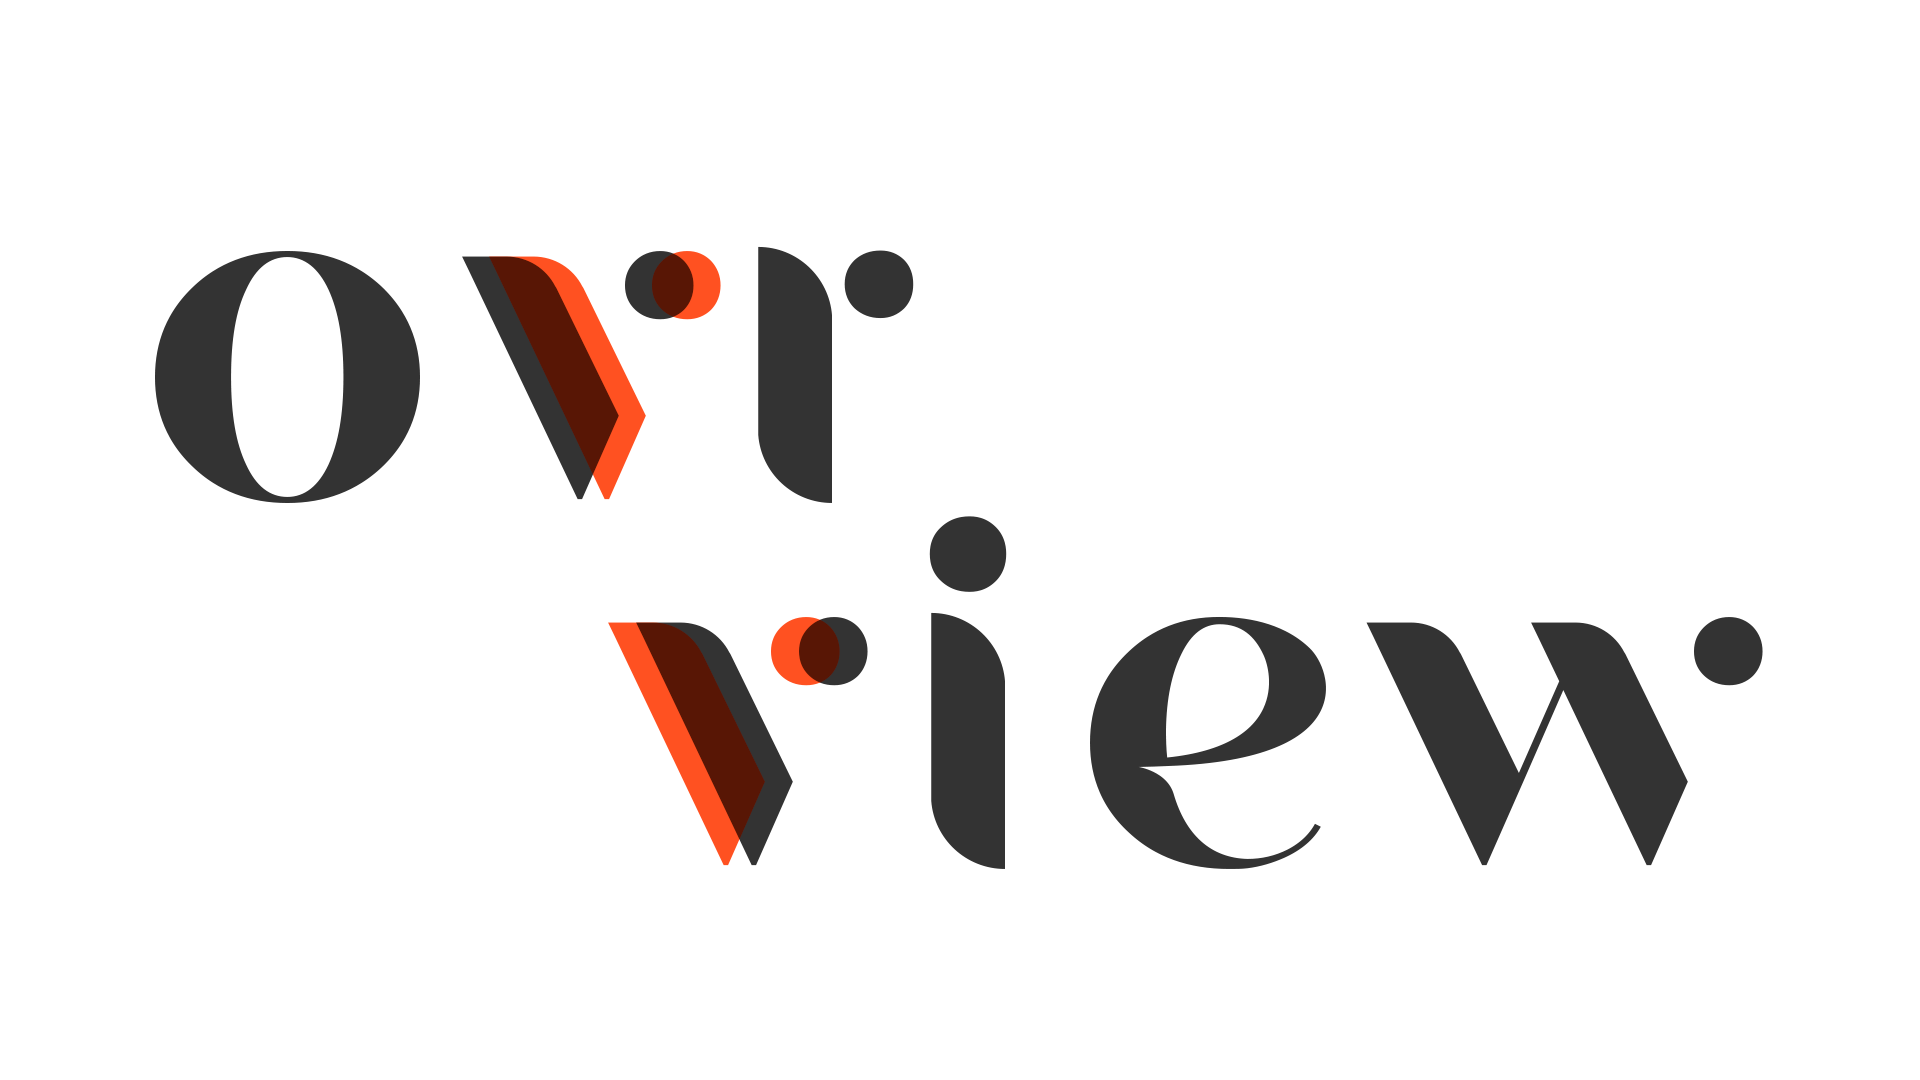 logo ovrview